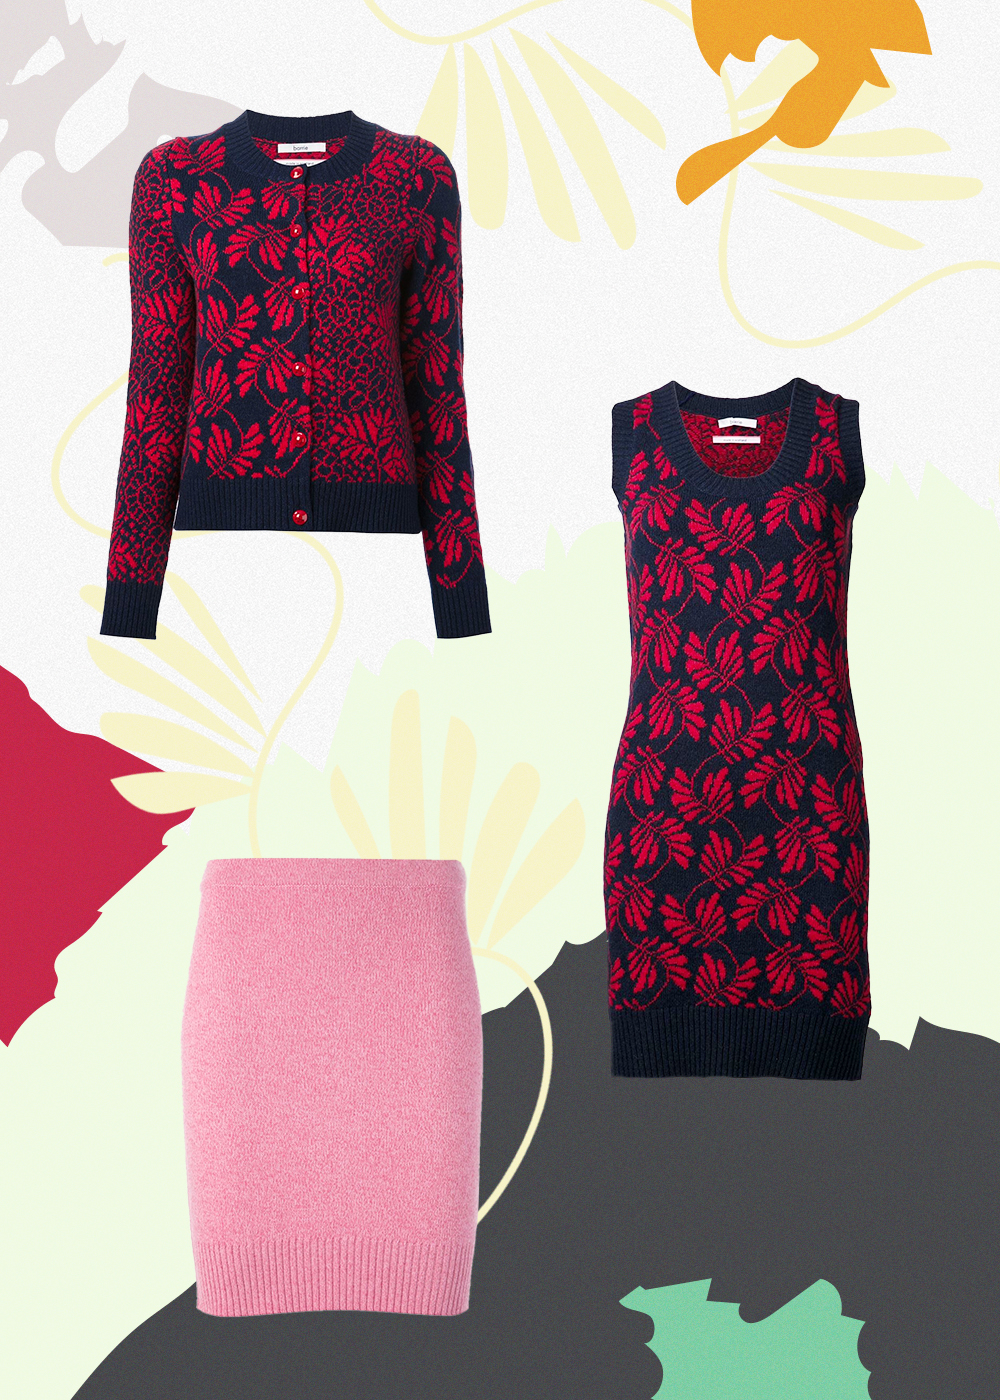 Maison-Mittweg-Barrie-Knitwear-Designers-Chanel-